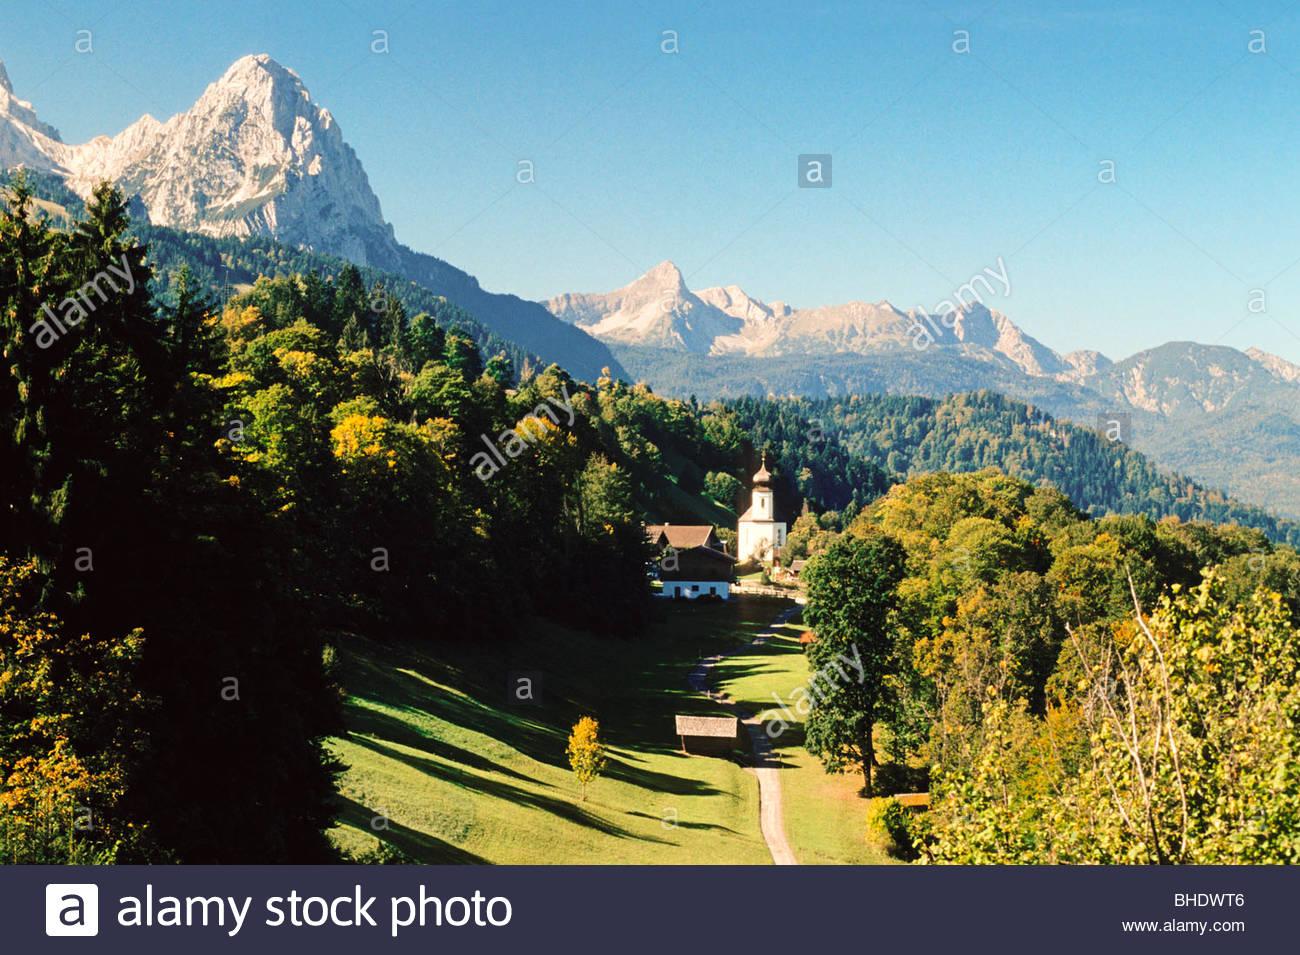 The hamlet of Walberg in the bavarian Alps. Bavaria, germany - Stock Image